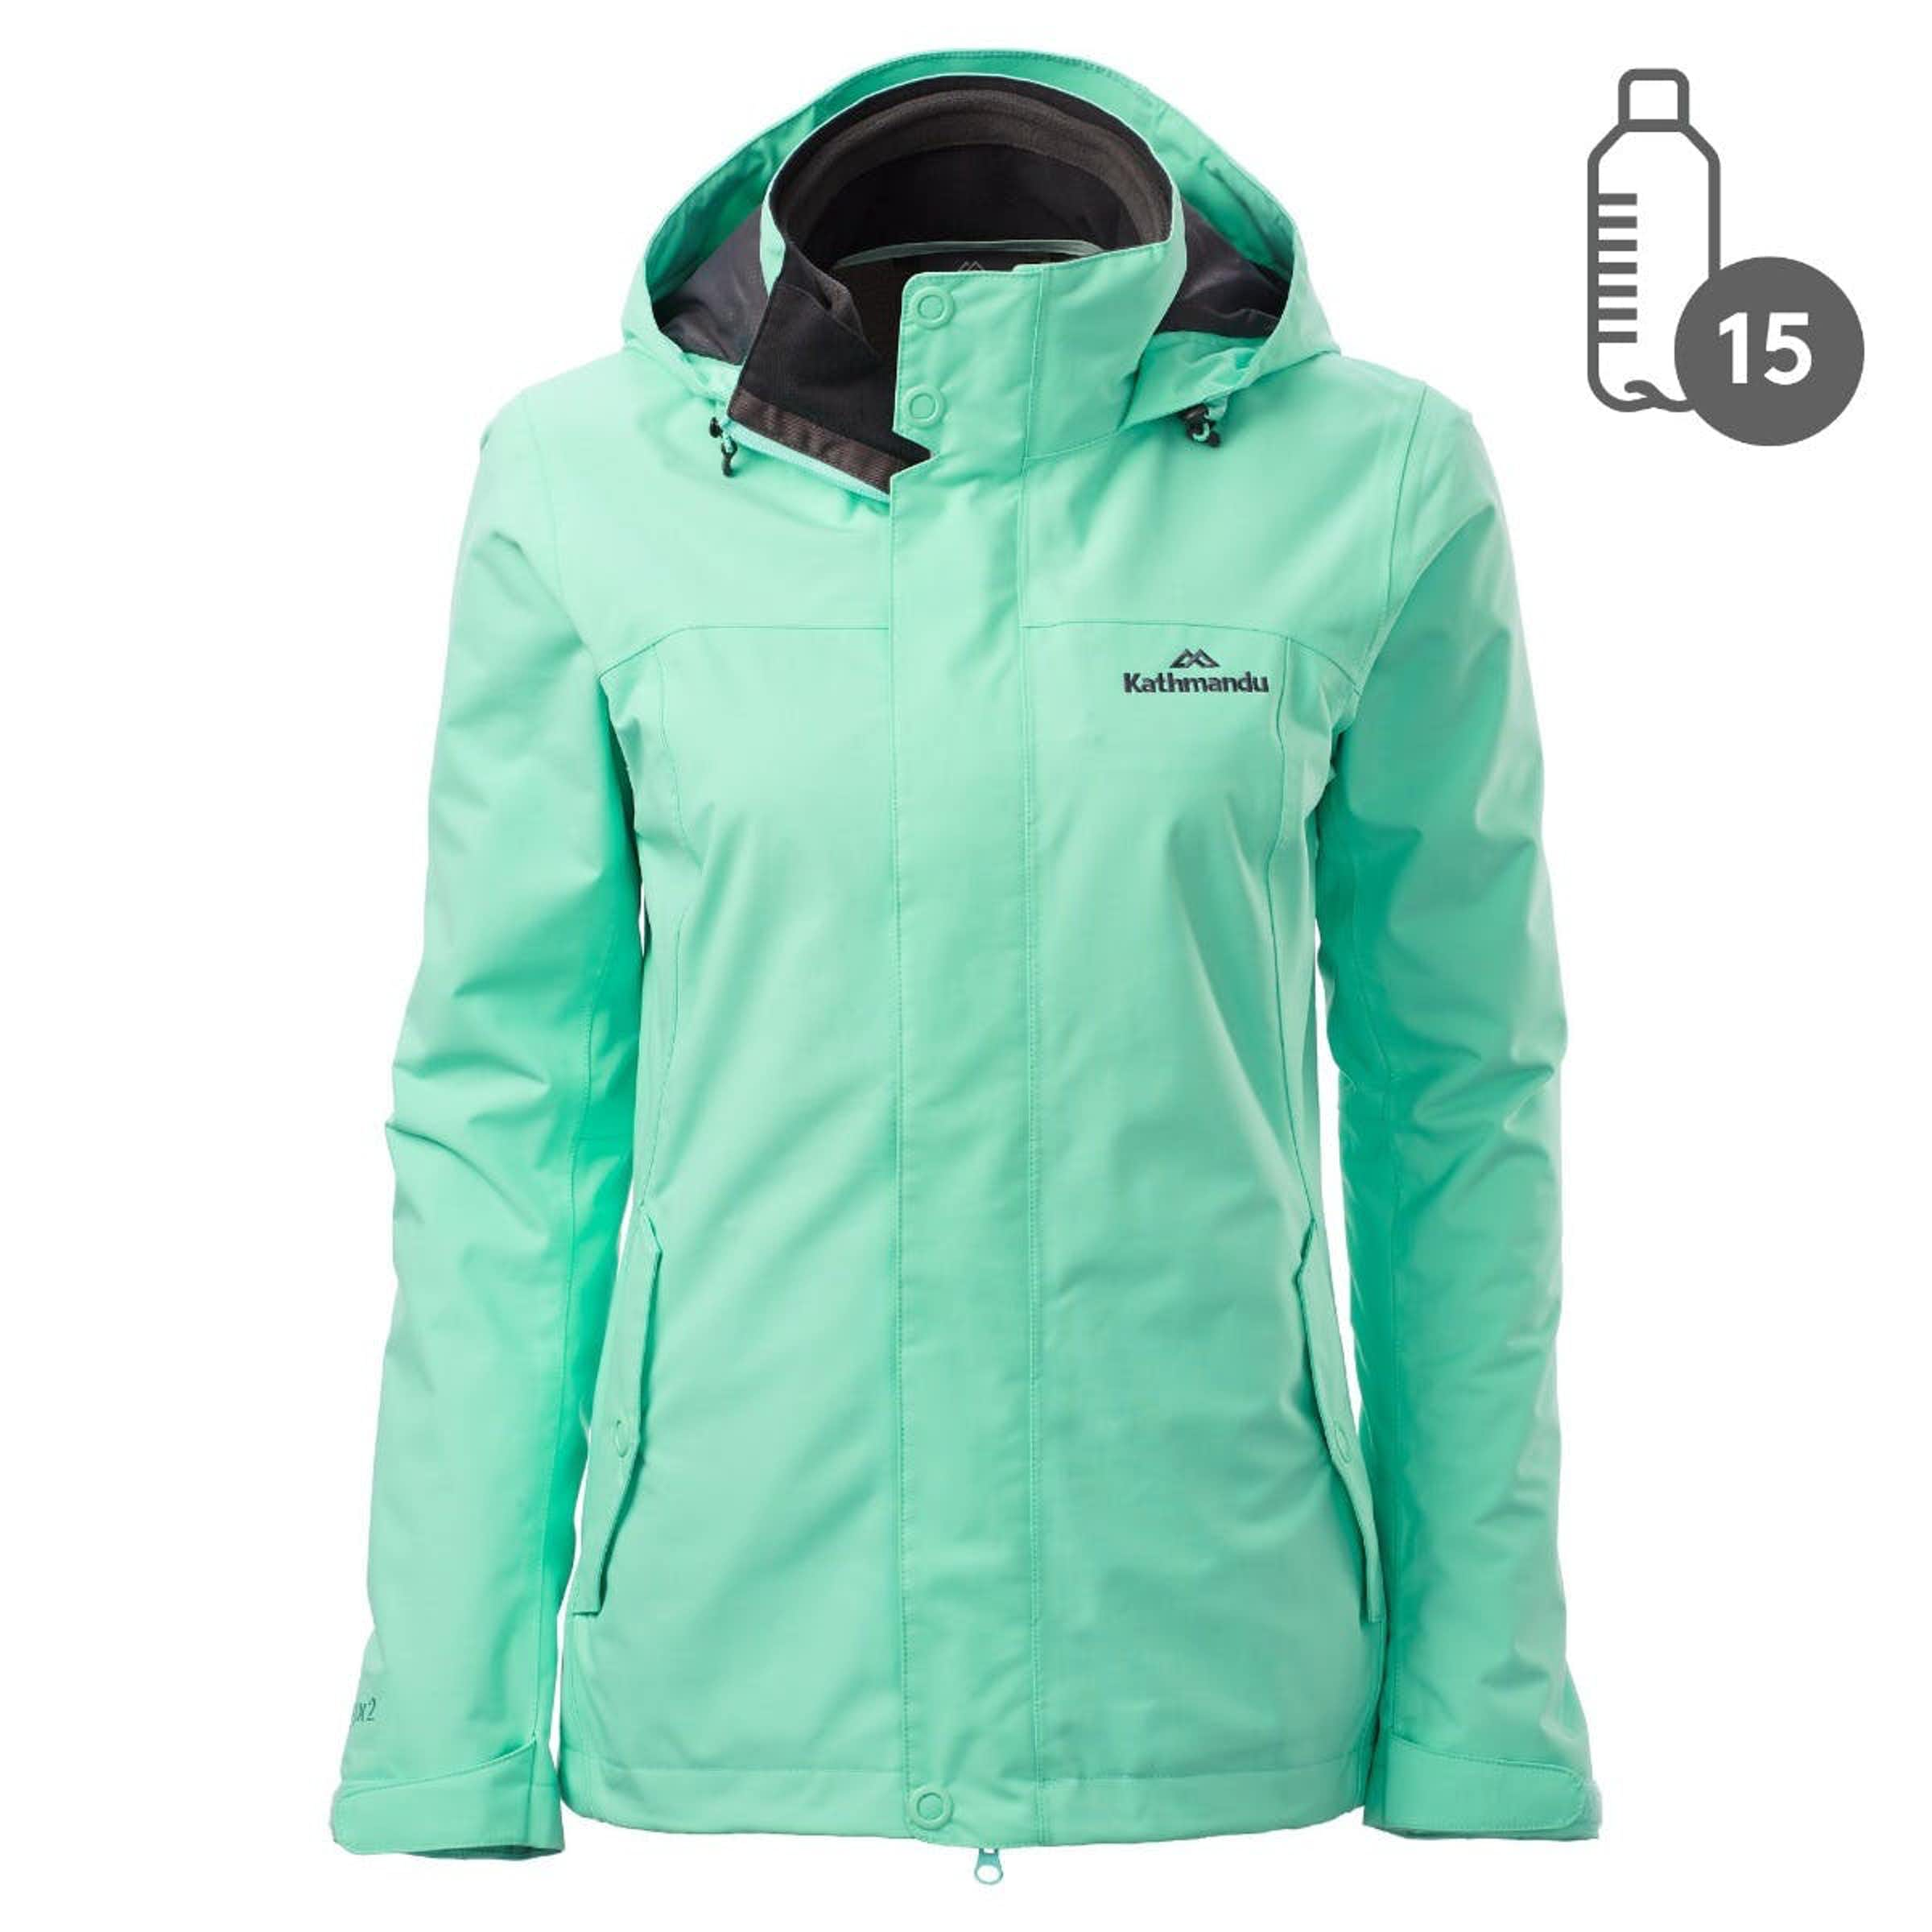 Isograd Women · Isograd Women s ngx 3-in-1 Rain Jacket e0d2c0792